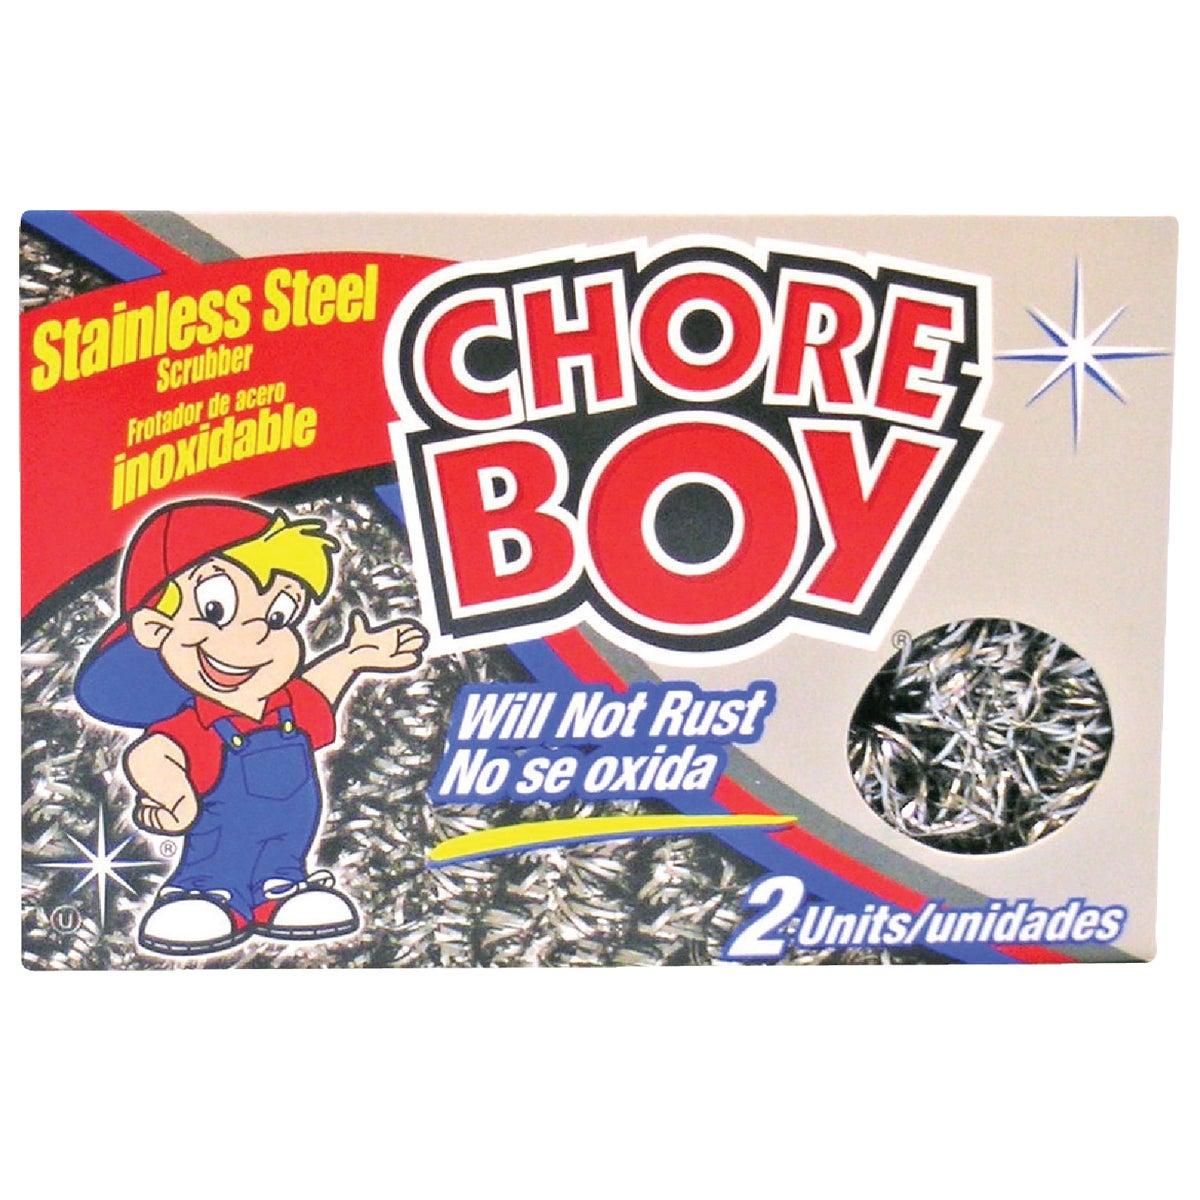 SS CHORE BOY